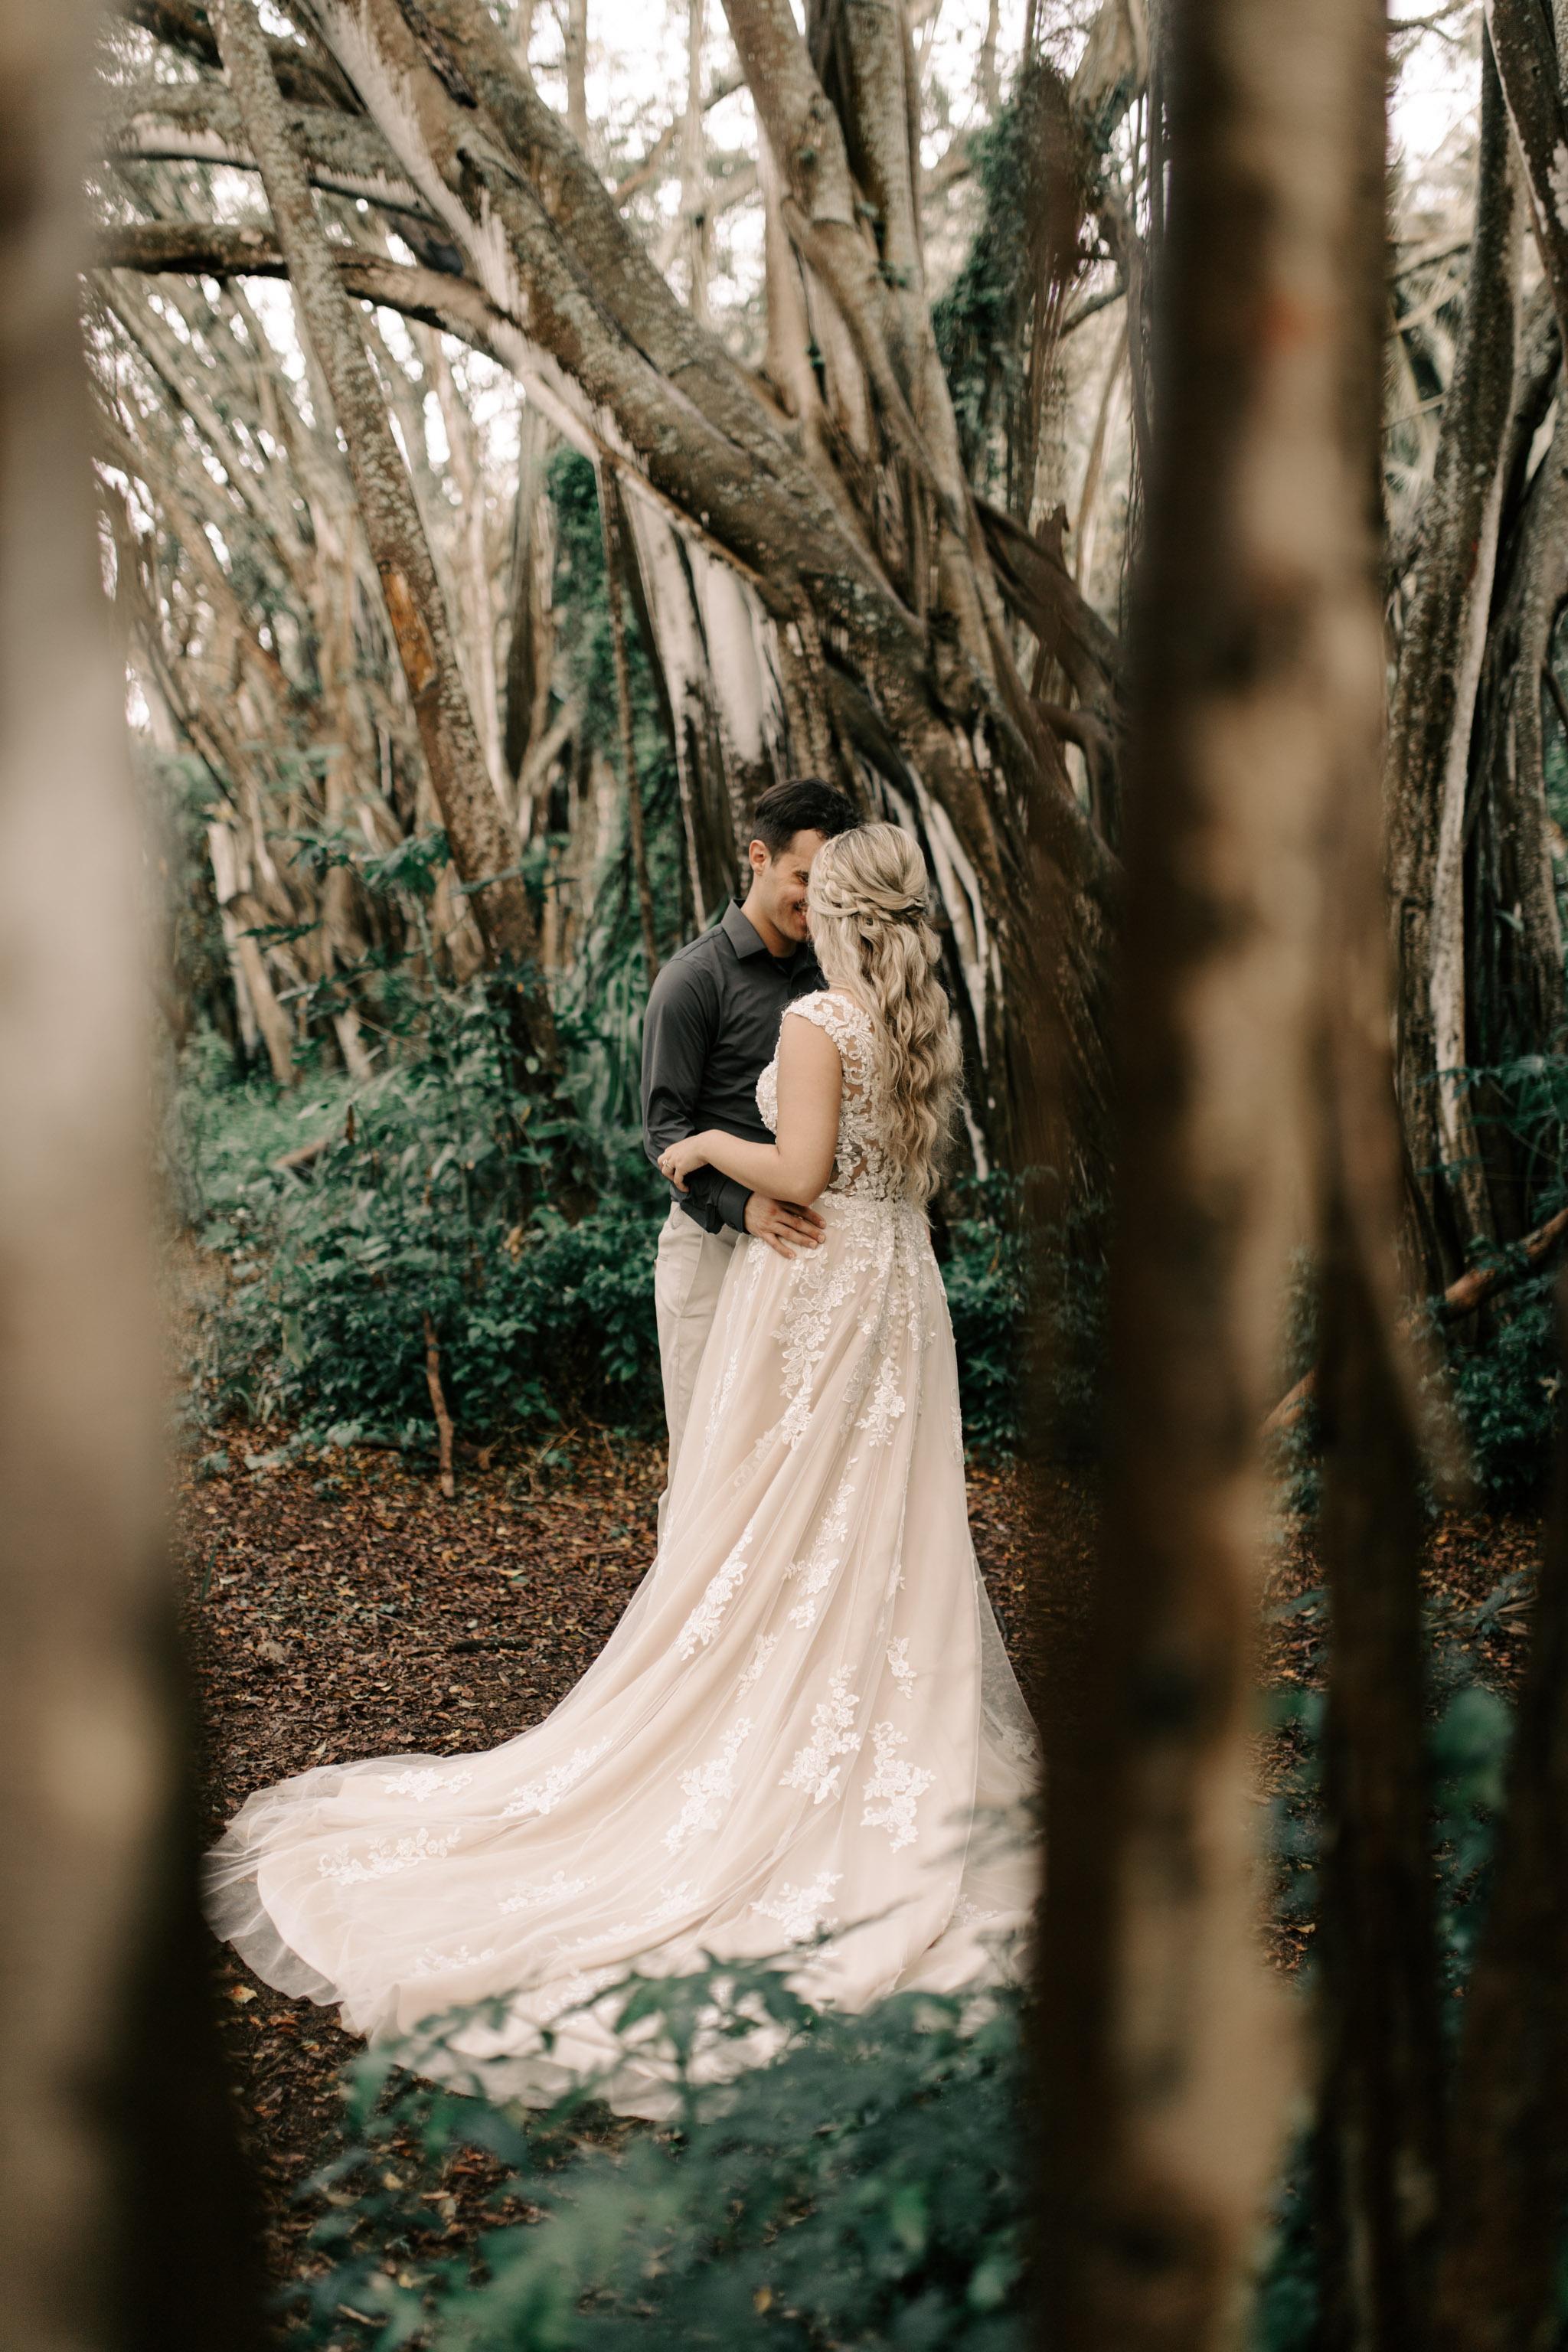 Kawela Bay Elopement By Hawaii Wedding Photographer Desiree Leilani